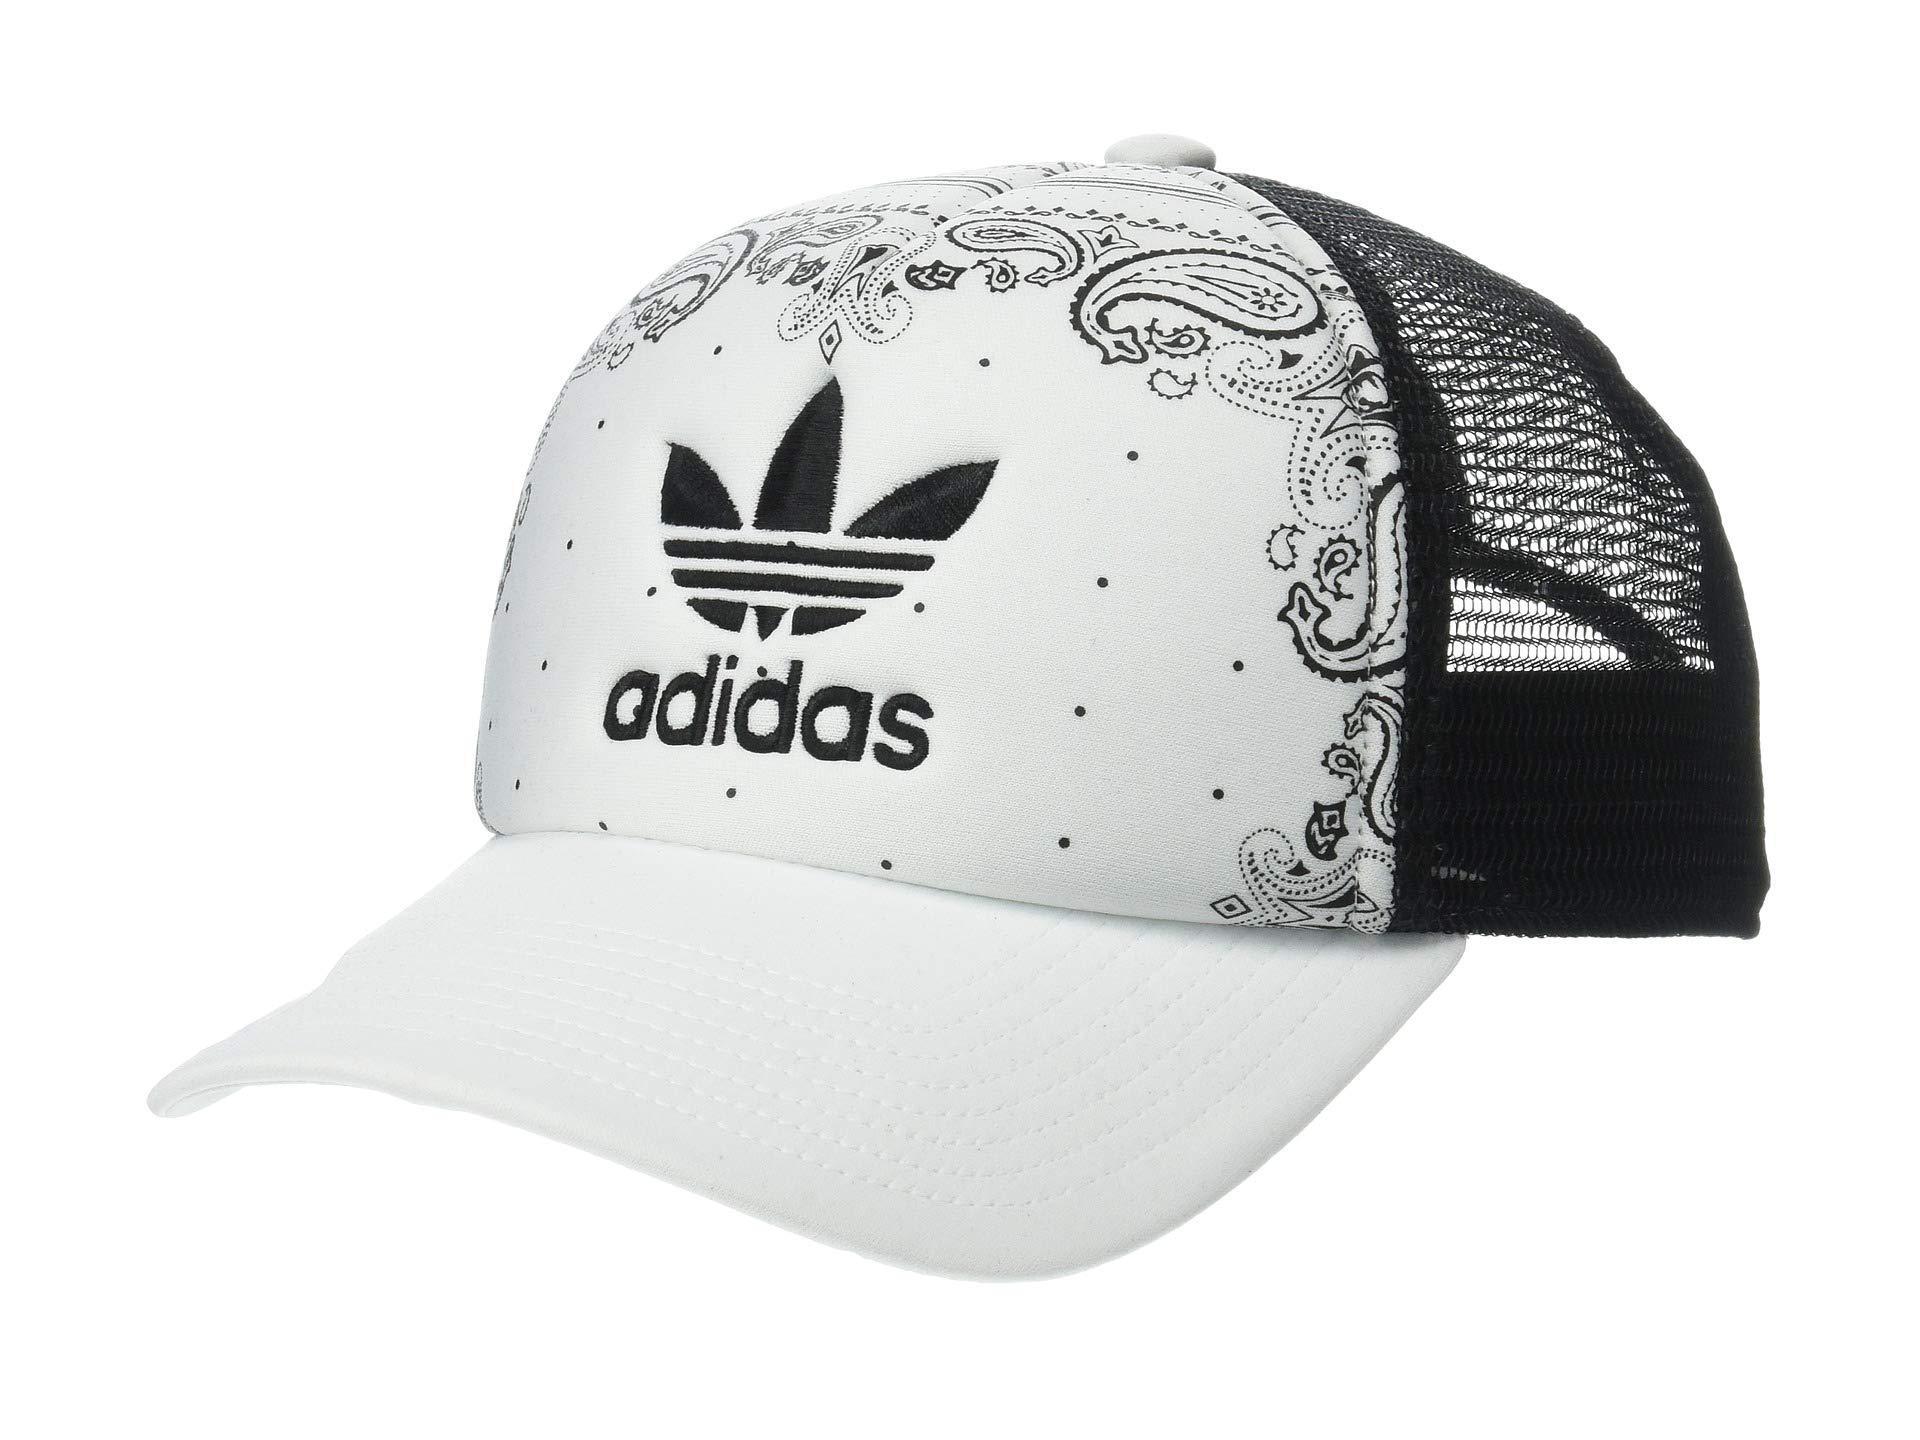 87db6d8ce28 adidas Originals. Women s Originals Foam Trucker (white black Bandana  Print) Caps